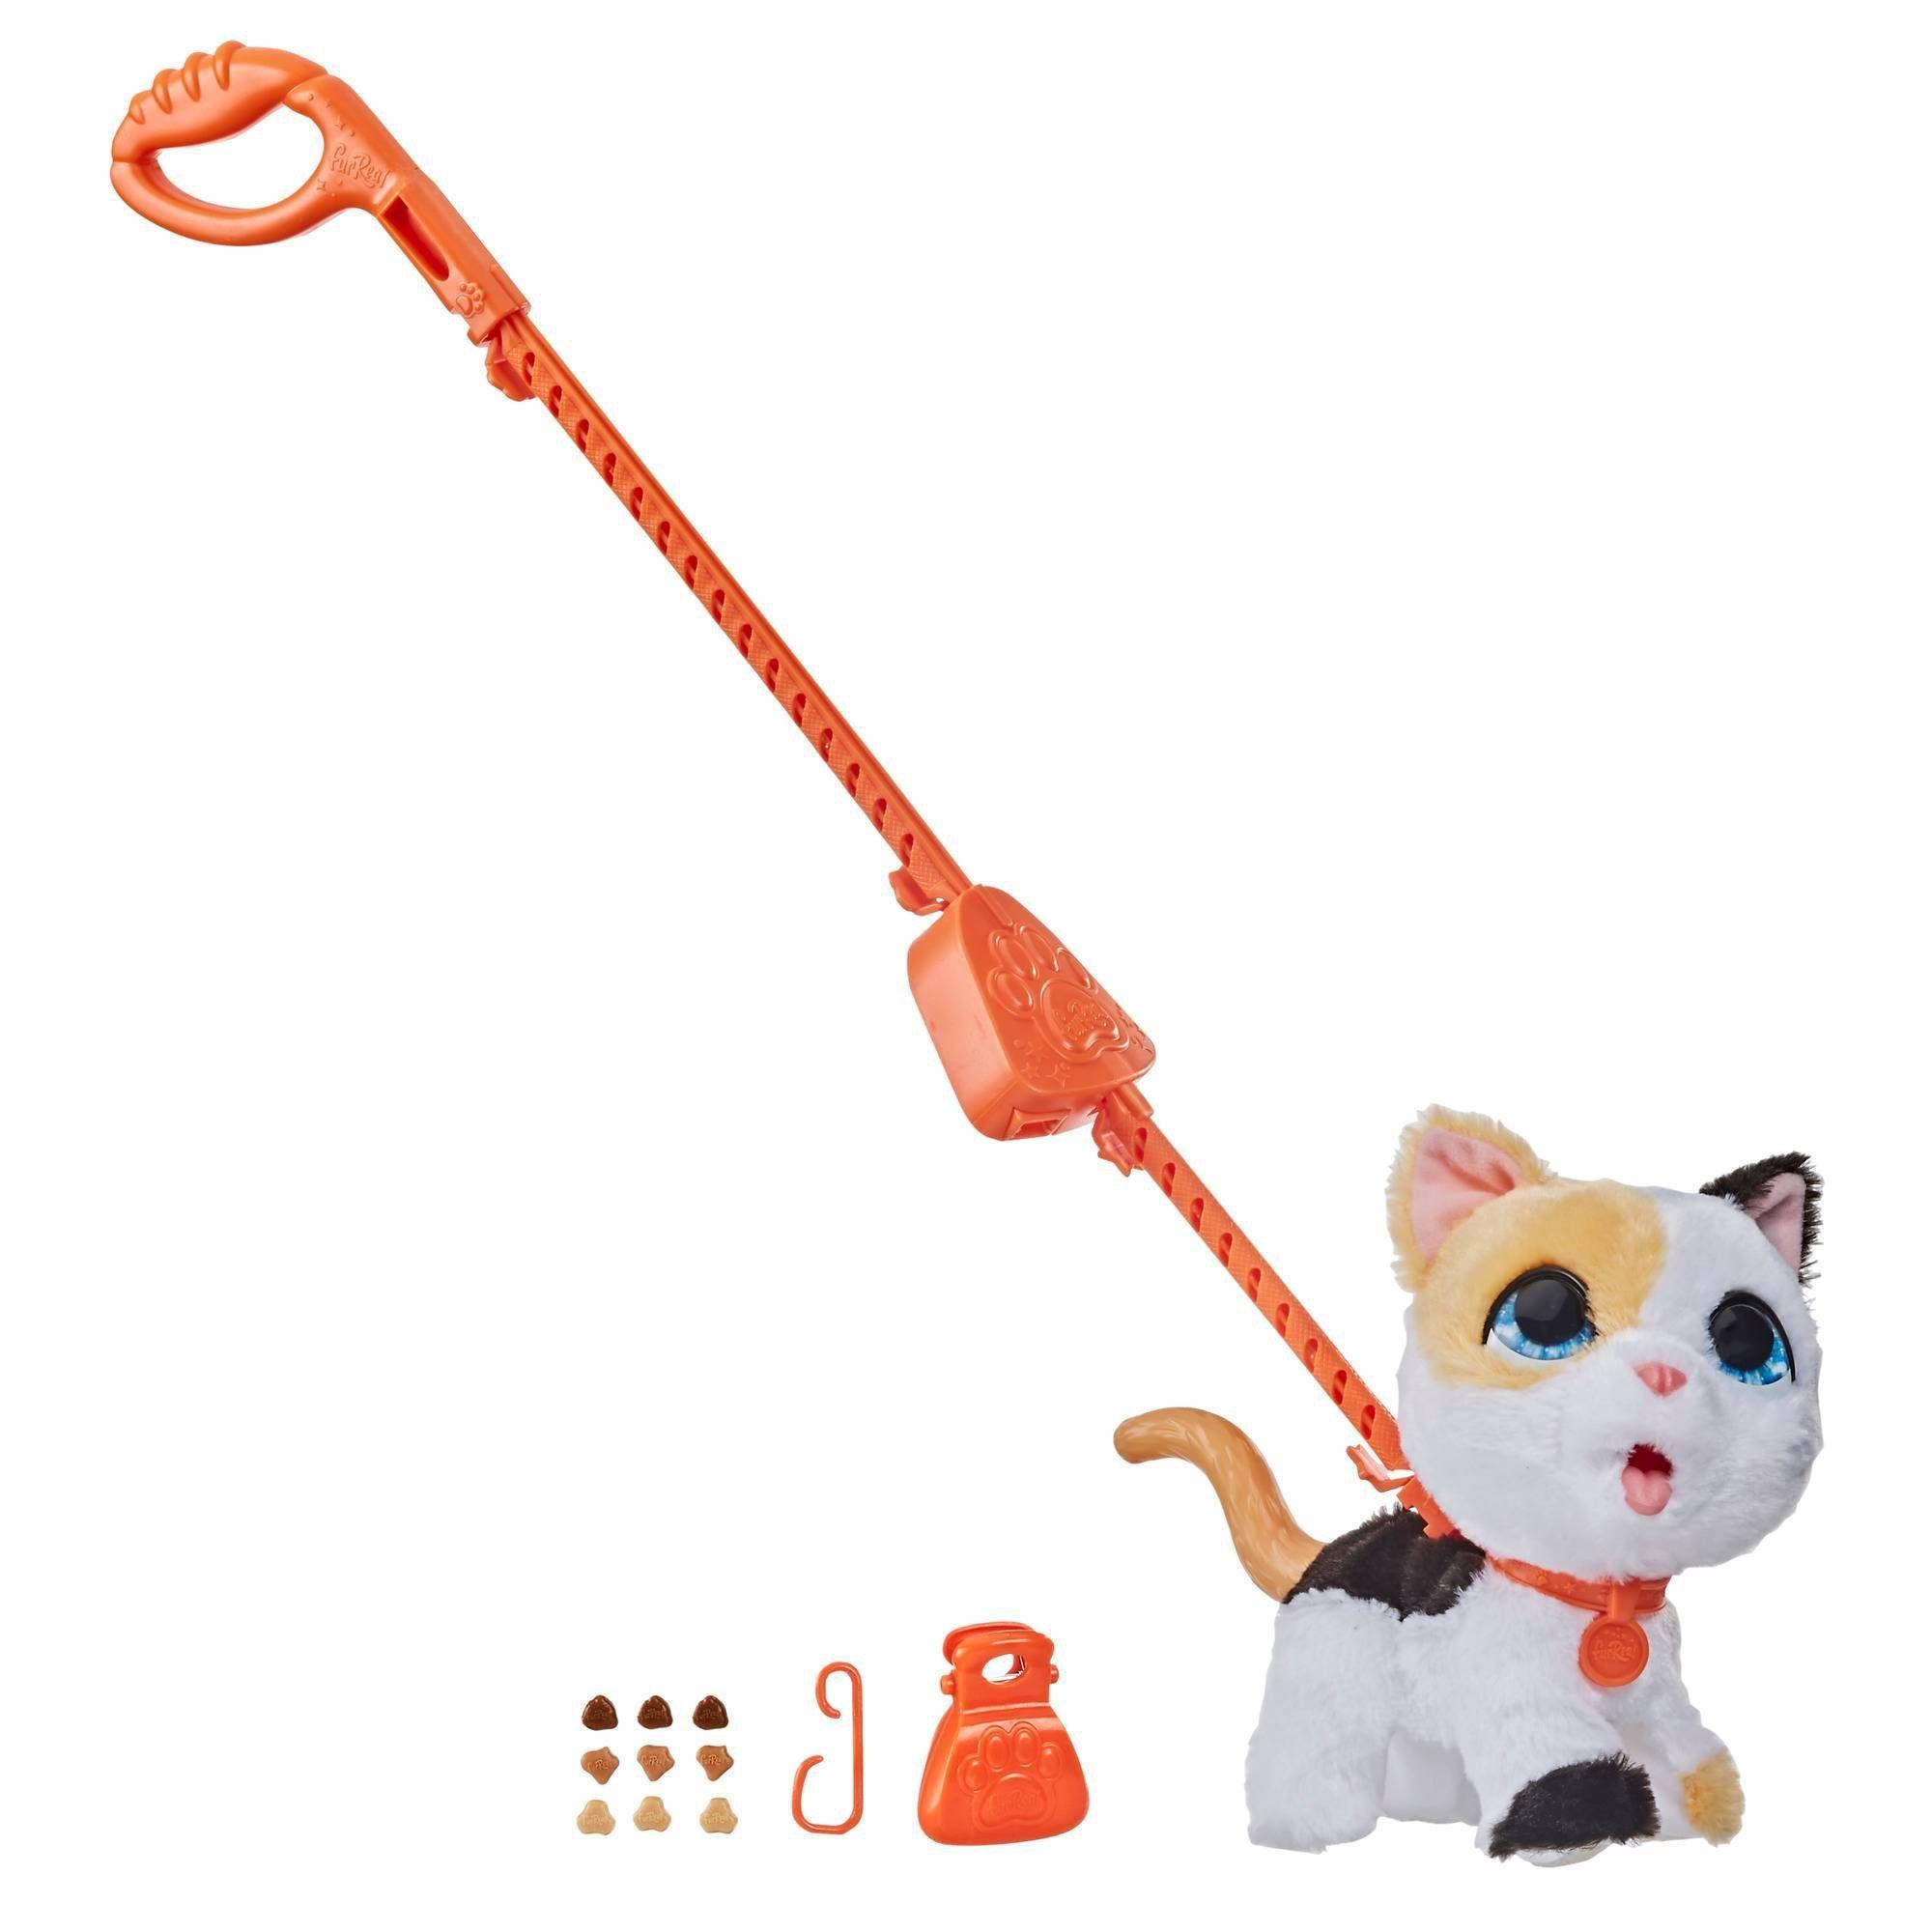 Furreal Poopalots Big Wags Cat In 2020 Fur Real Friends Animal Figures Kitten Toys